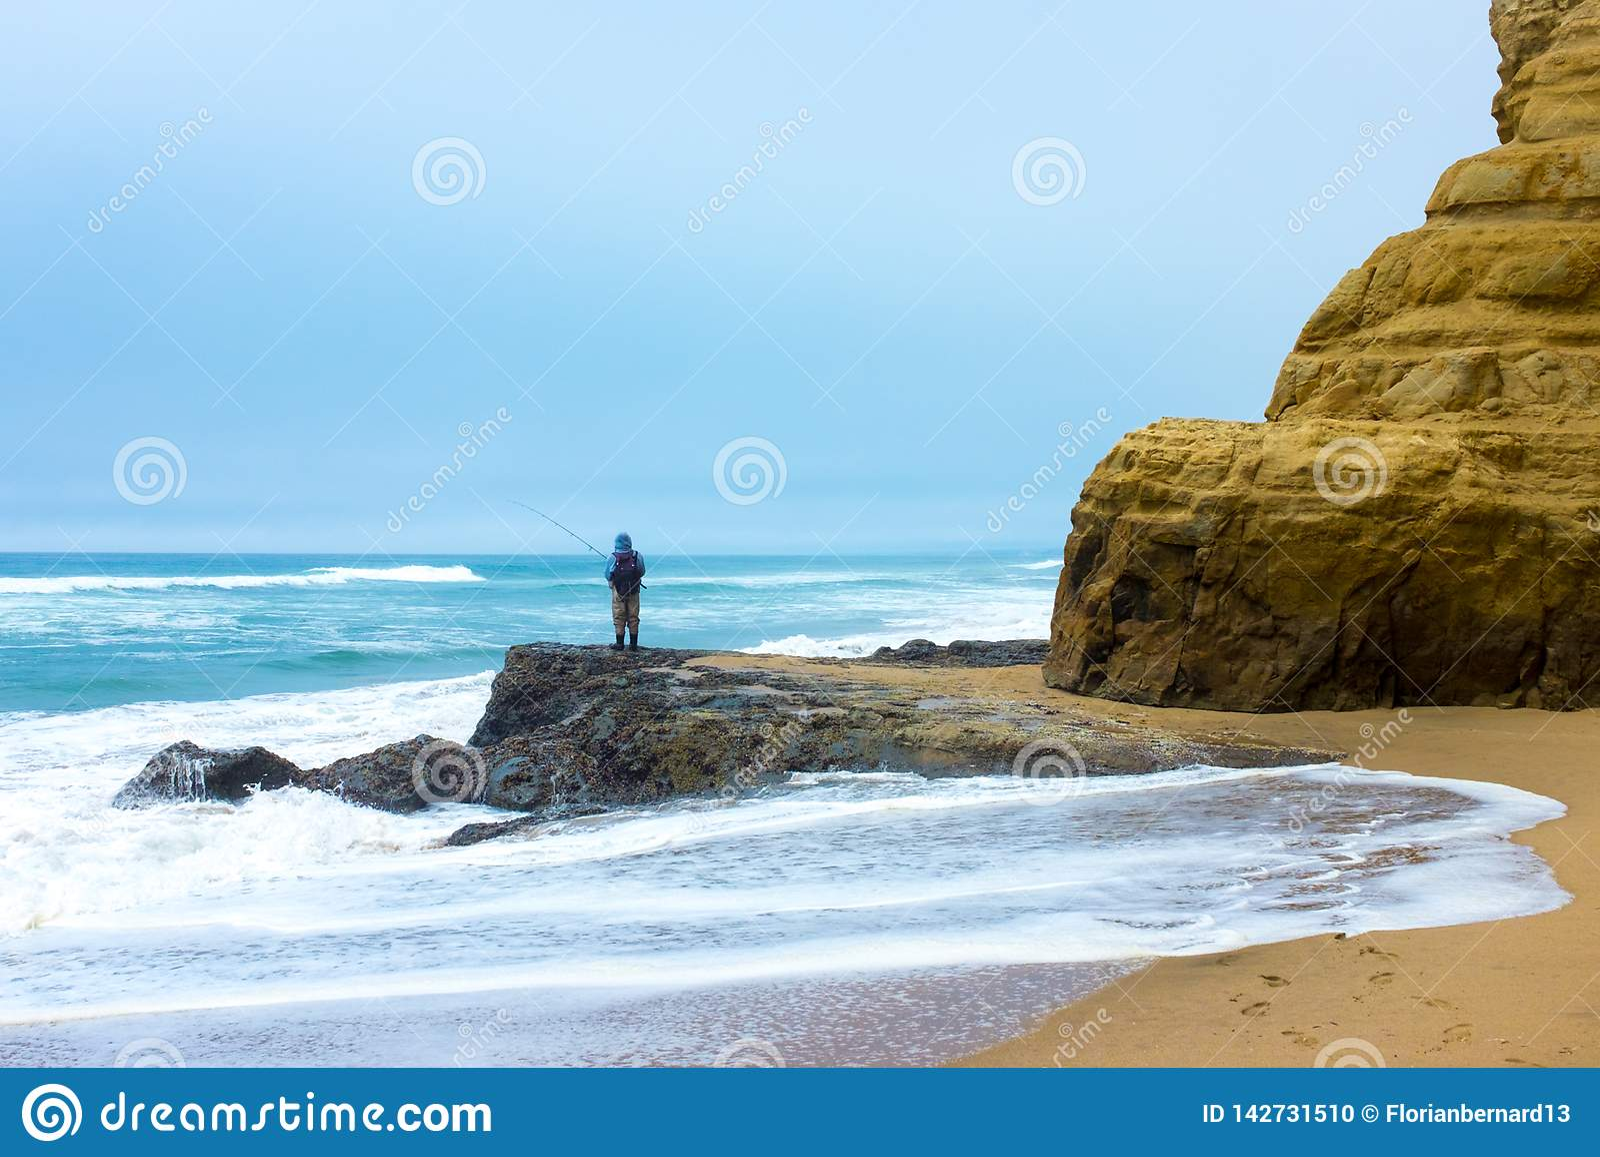 Fisherman in Half Moon Bay